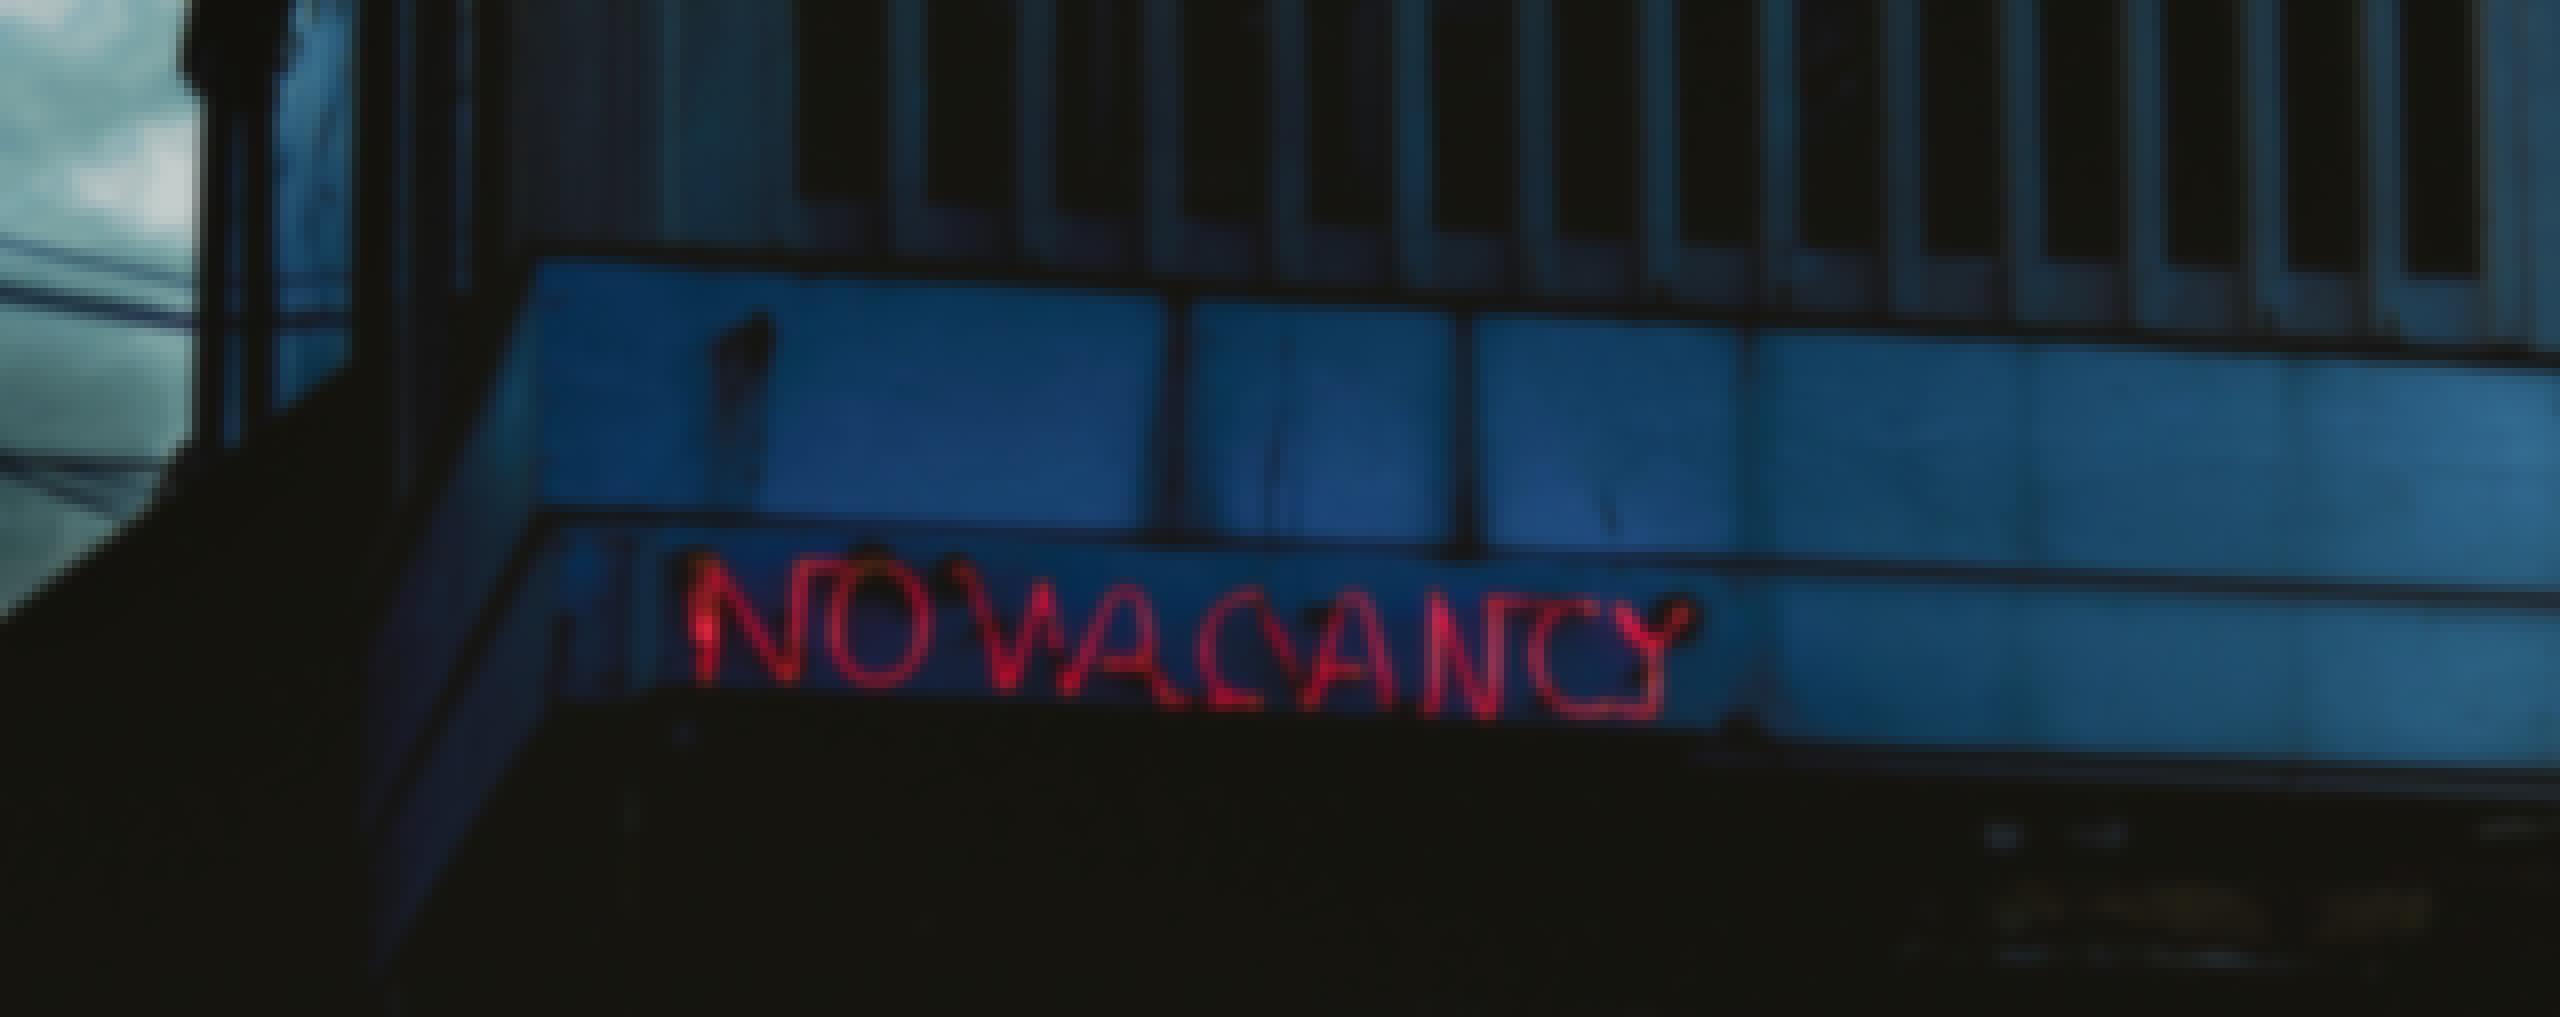 A no vacancy sign over a hotel building